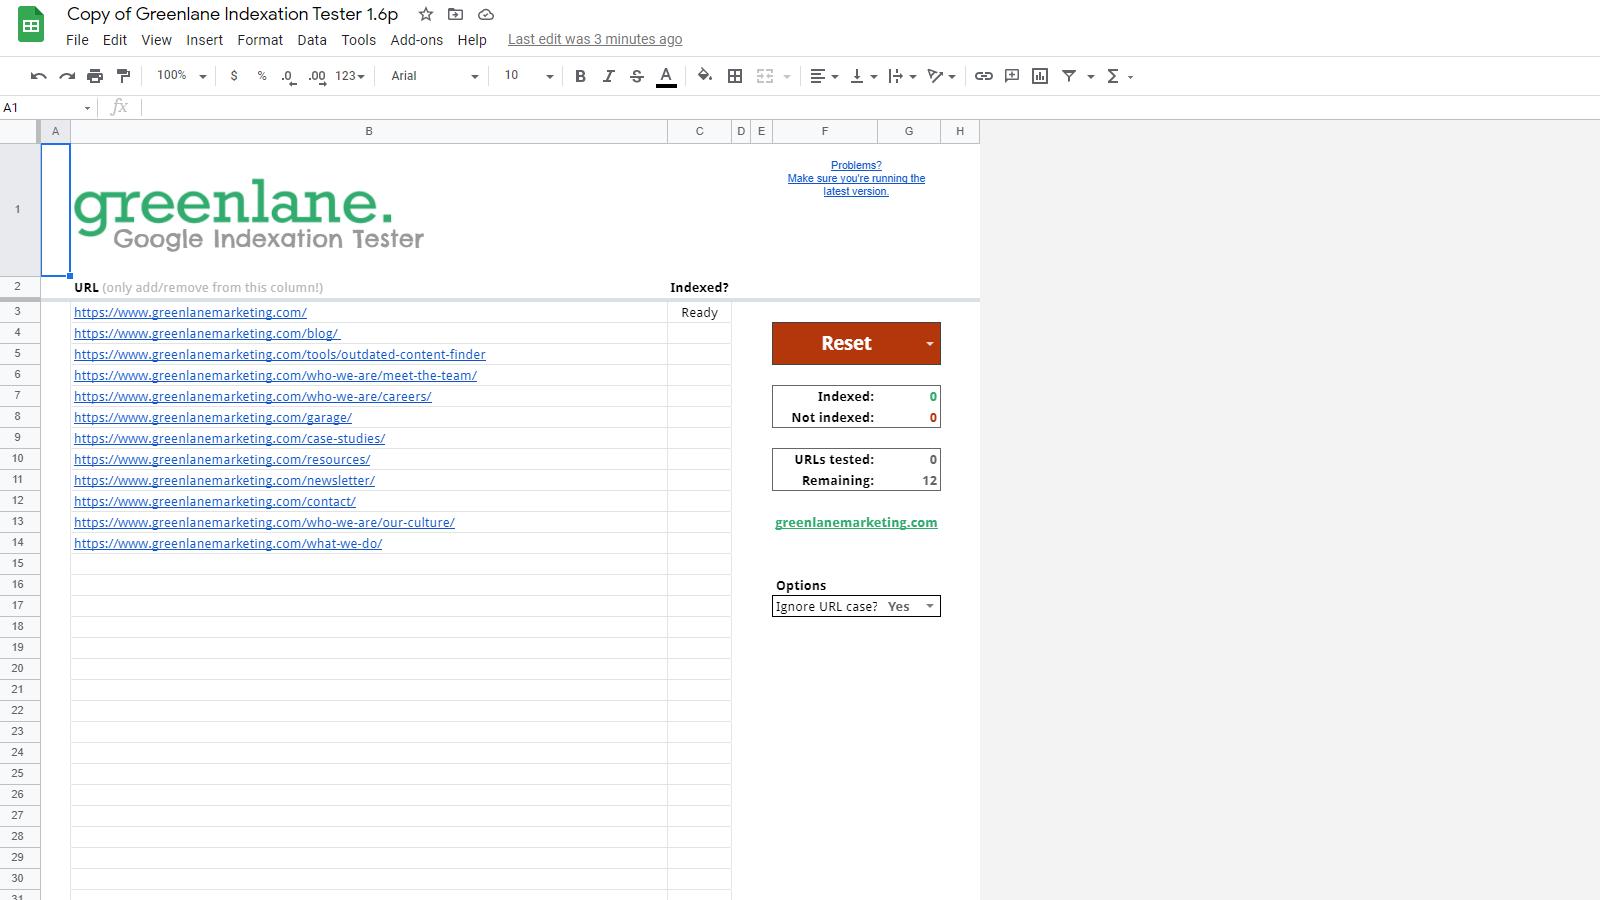 Google Indexation Tester